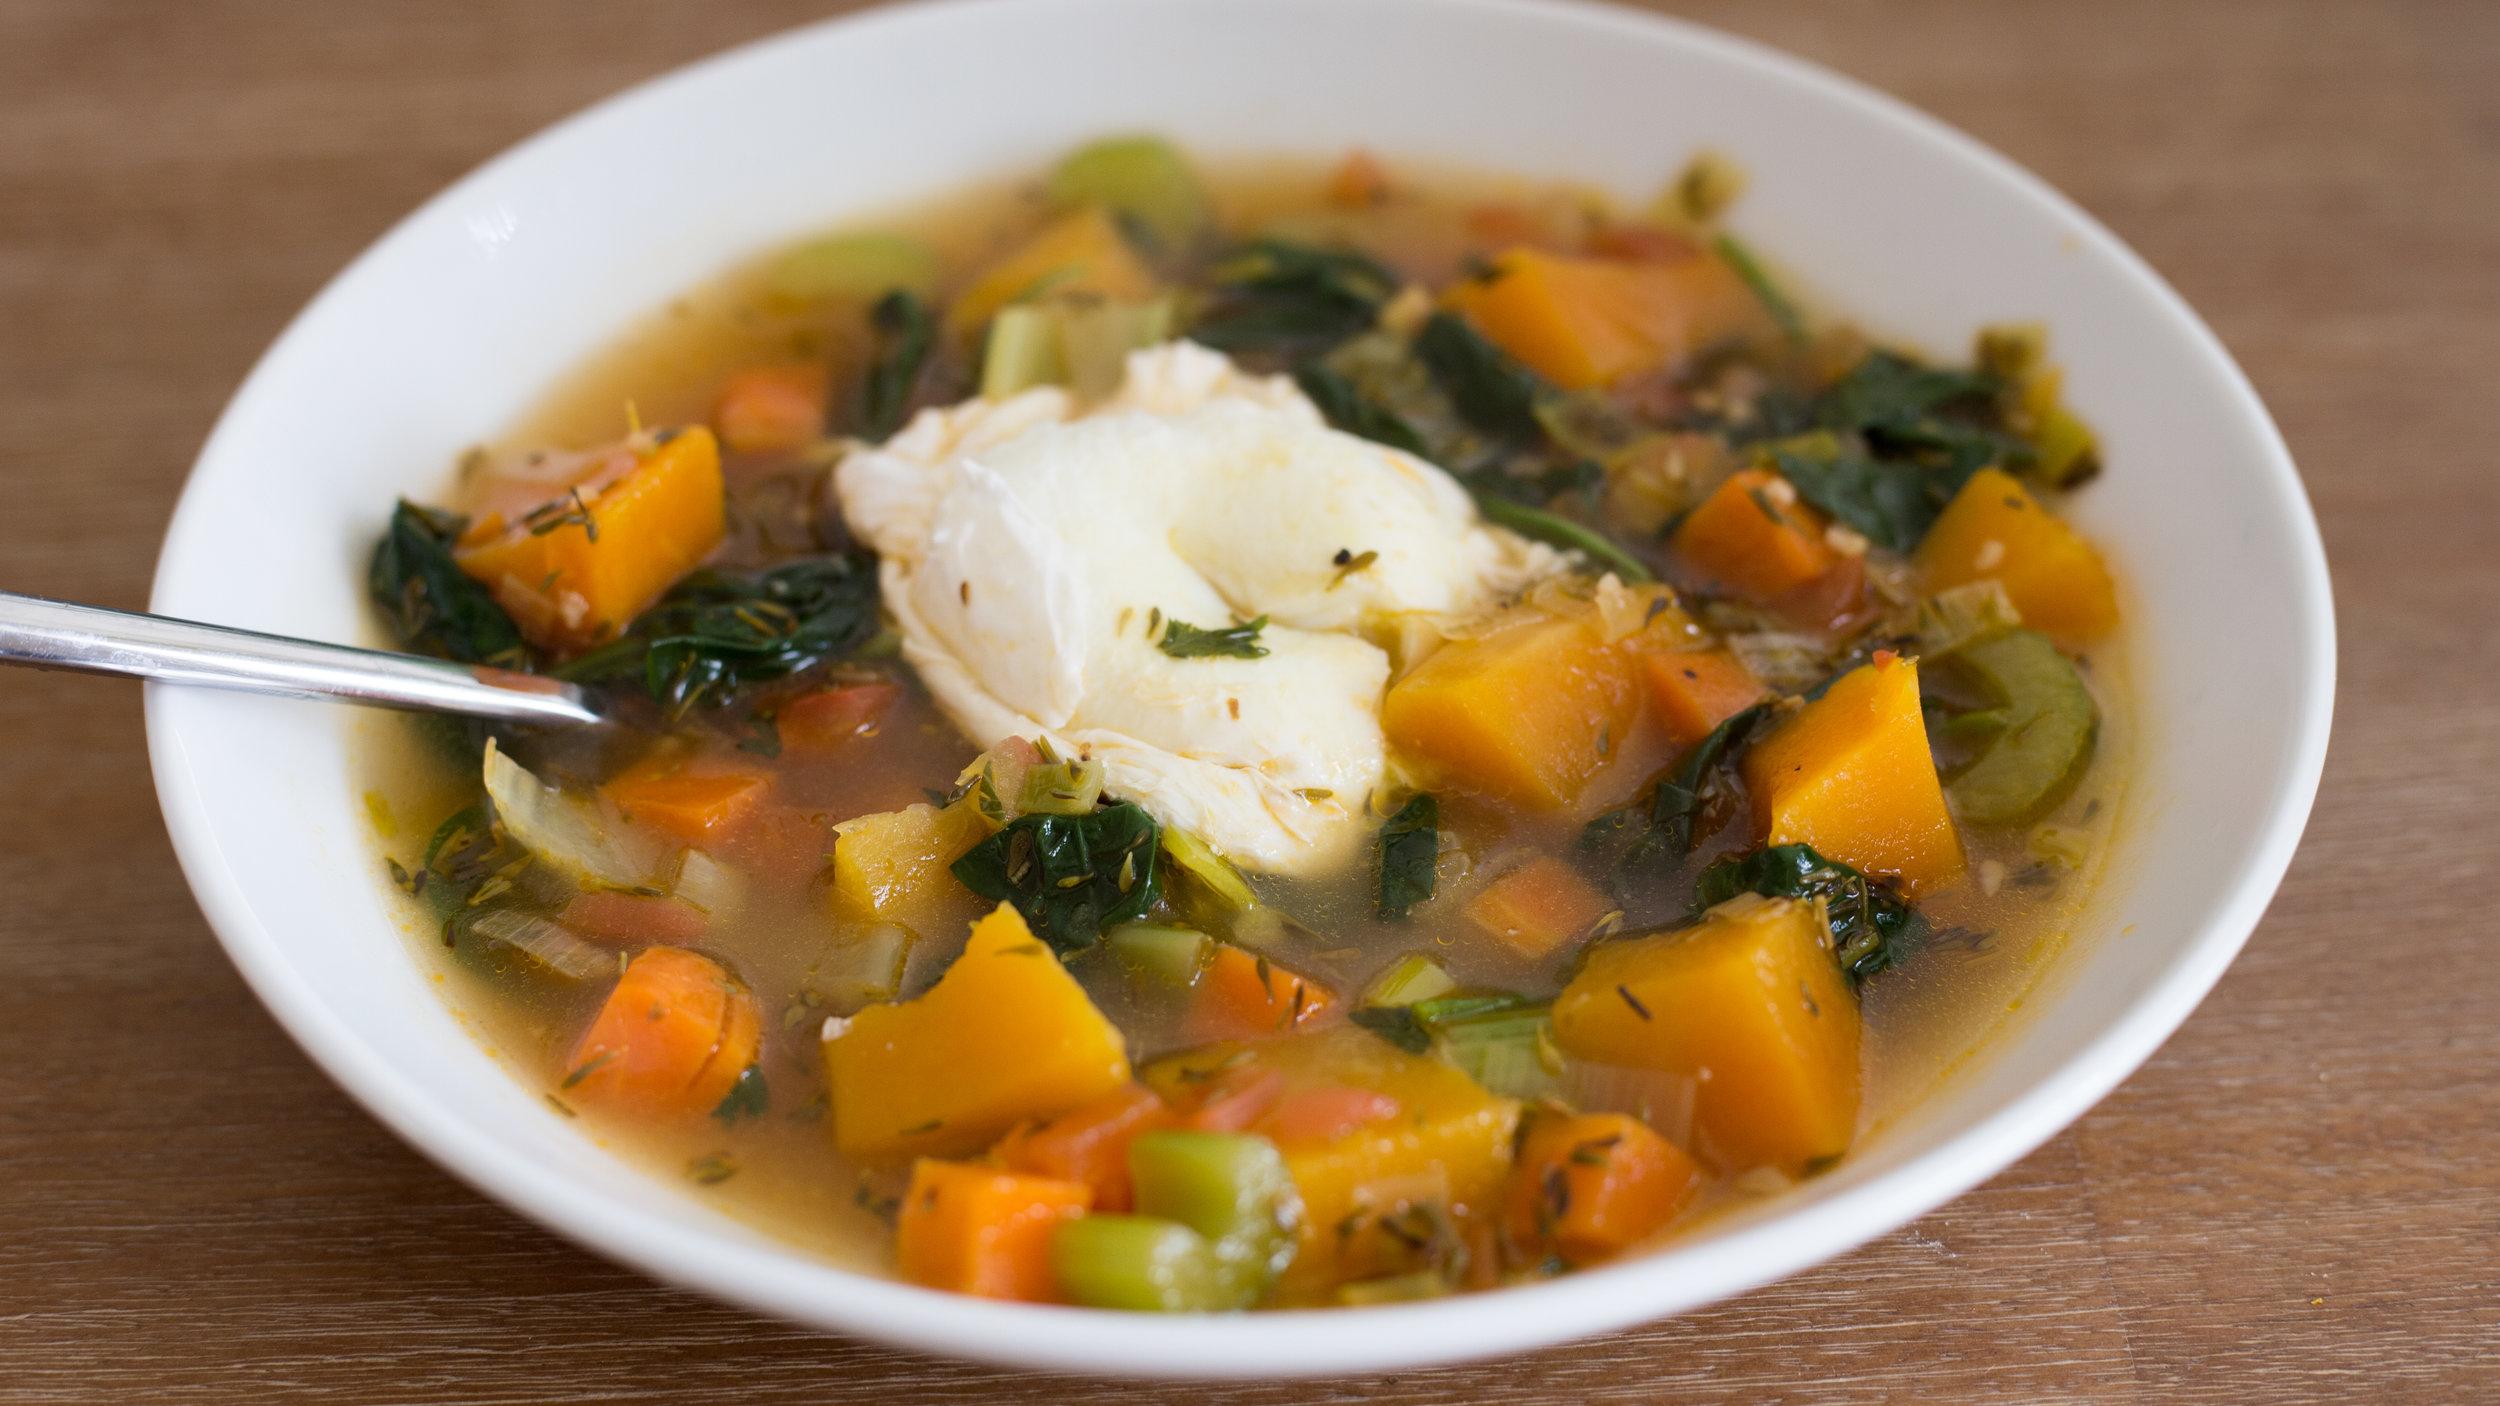 Veggie Harvest Soup Final Plated-2.jpg